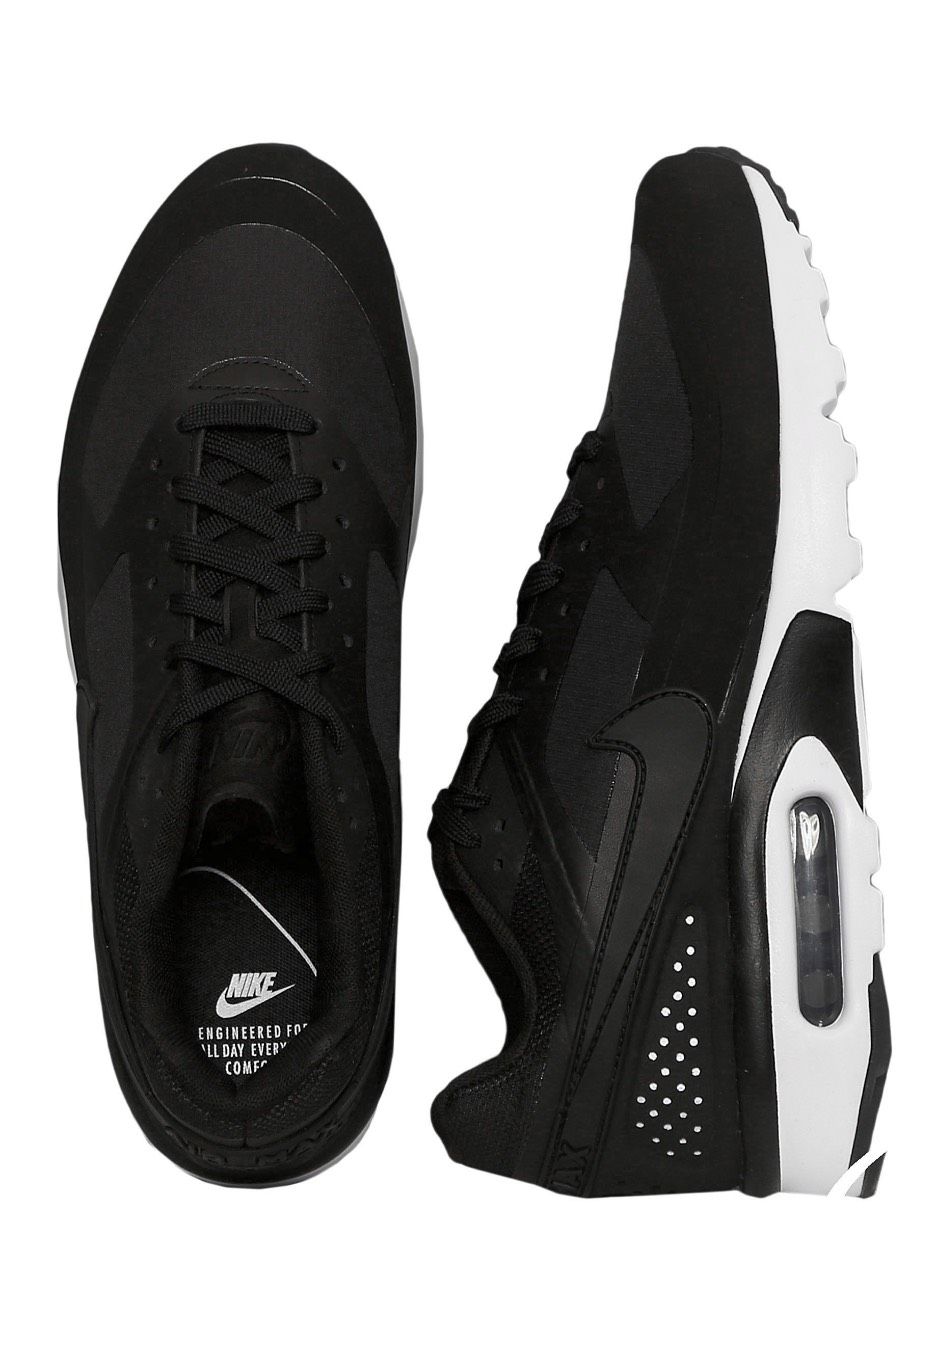 the best attitude eddc3 c06c6 Nike - Air Max BW Ultra Black Black Black White - Shoes - Impericon.com US